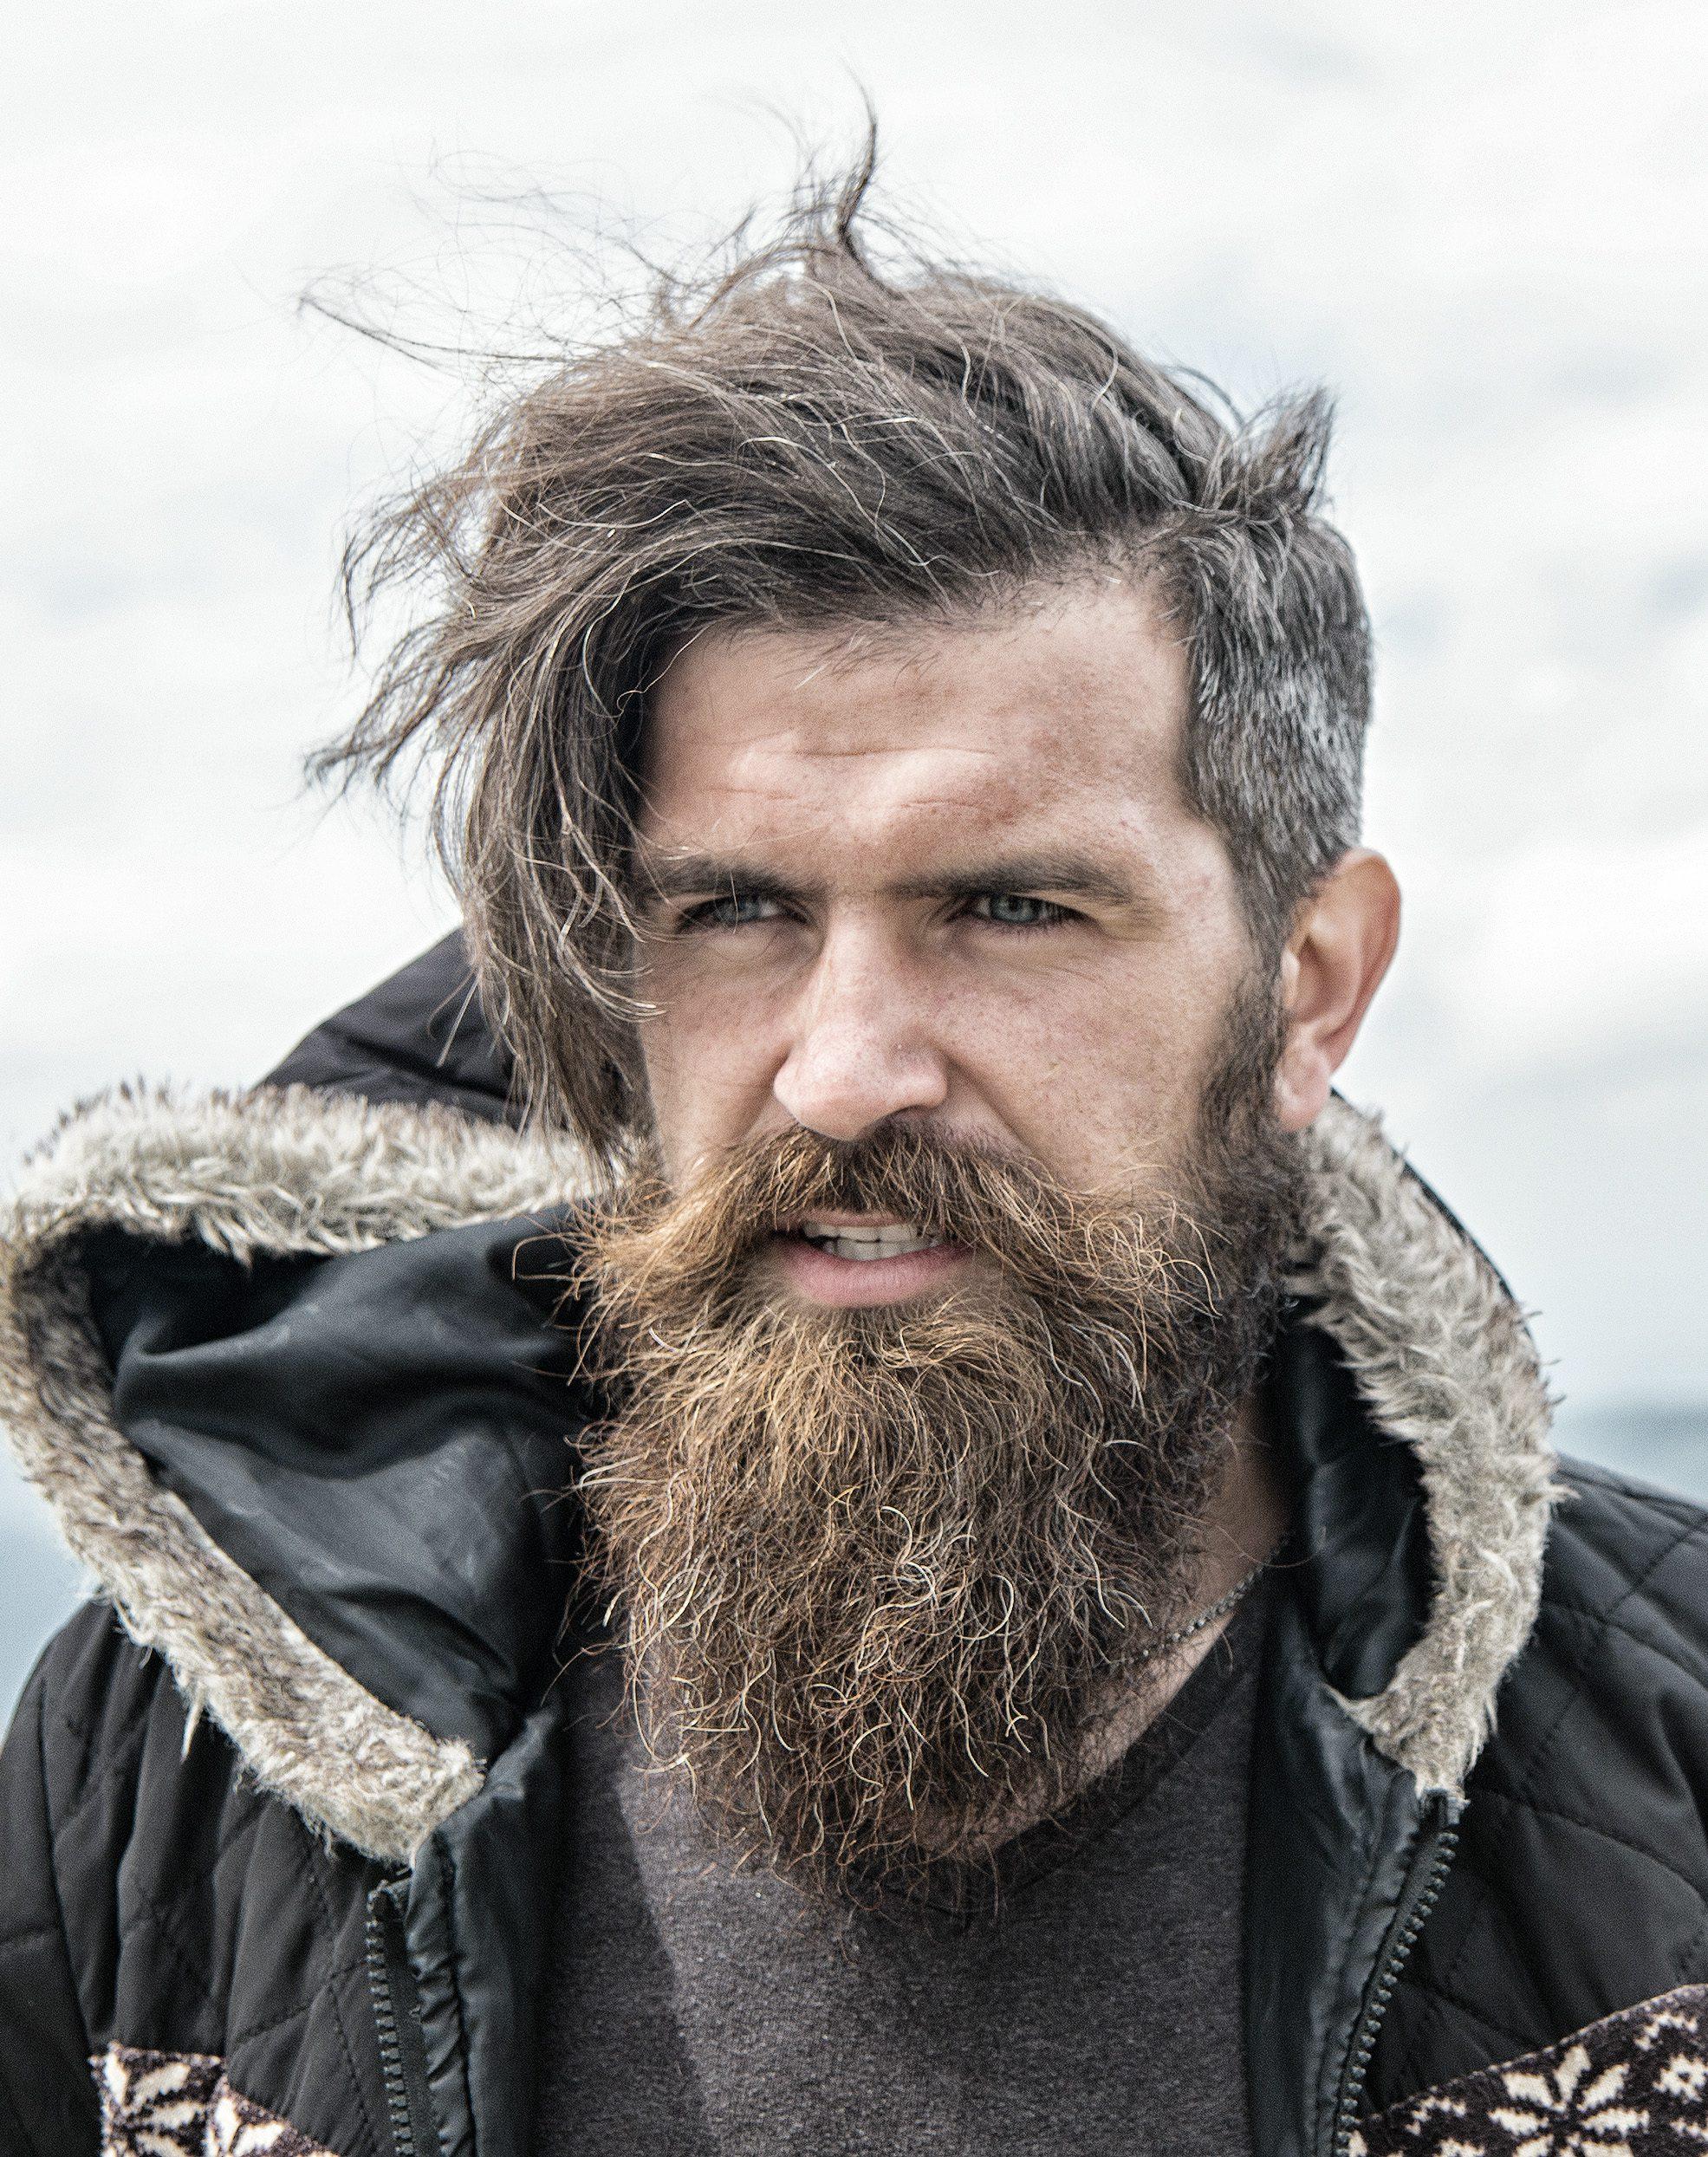 Rusty Long Beard with Rugged Hair